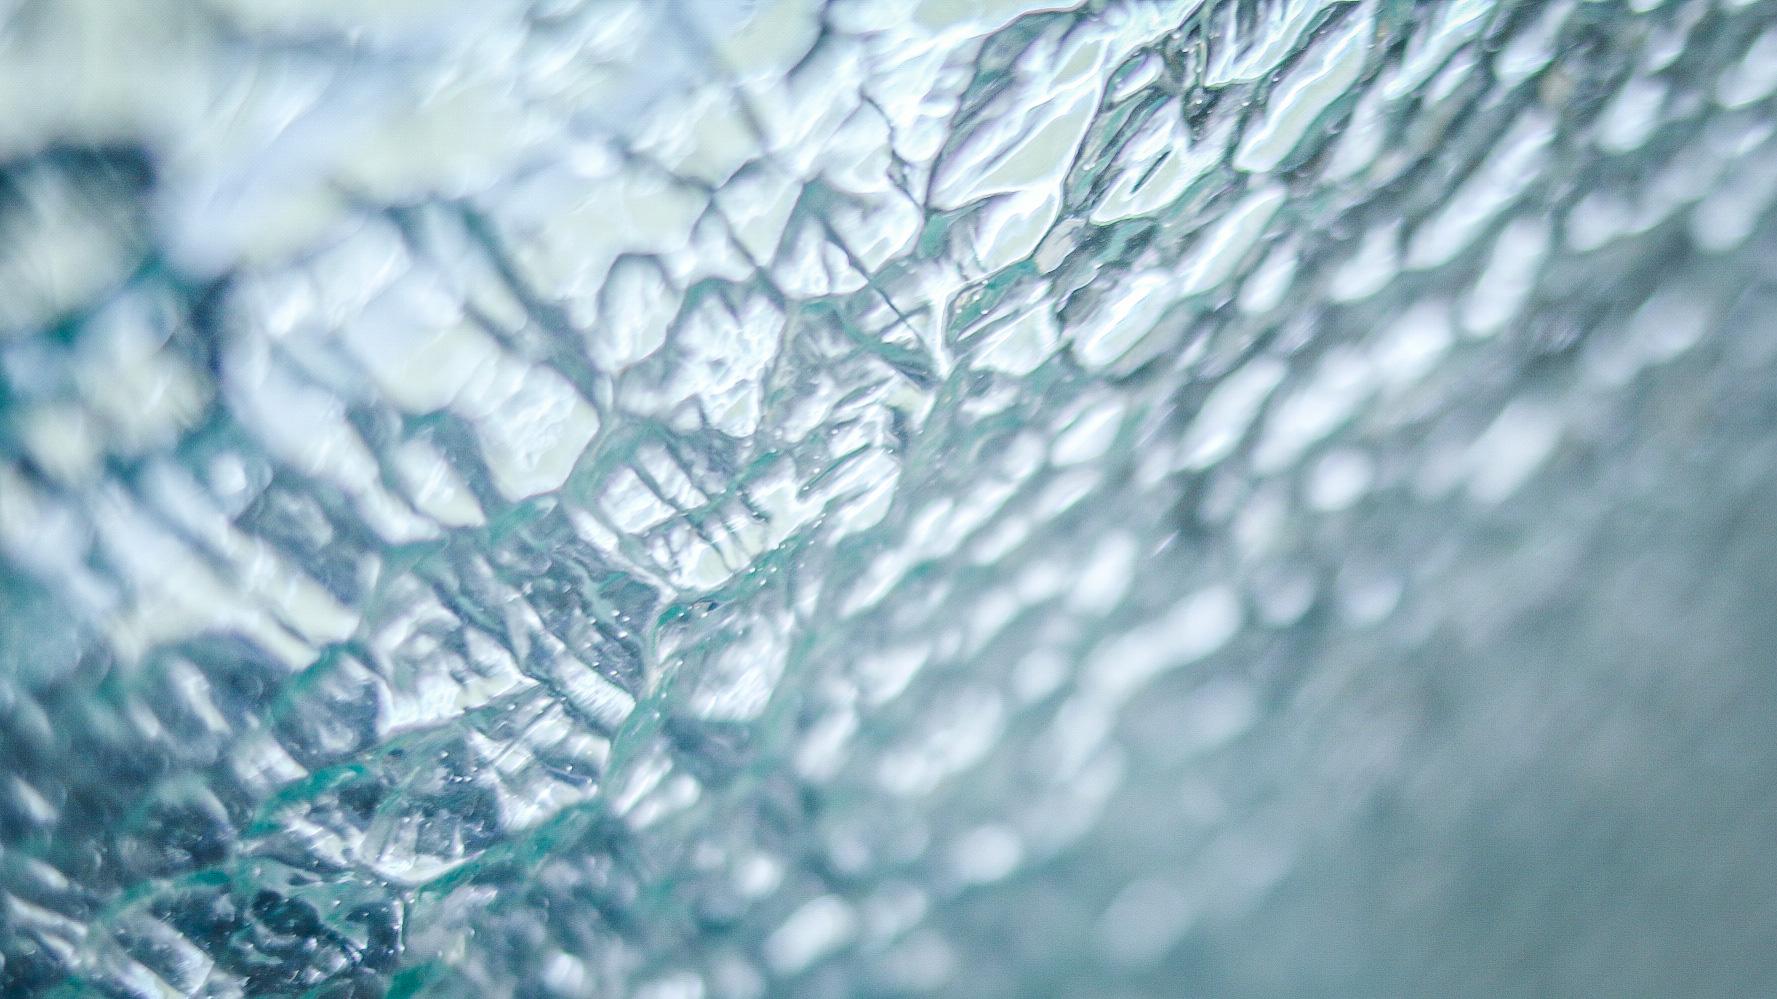 Figuurglas bij glasschade, Glasbreuk Herstel®